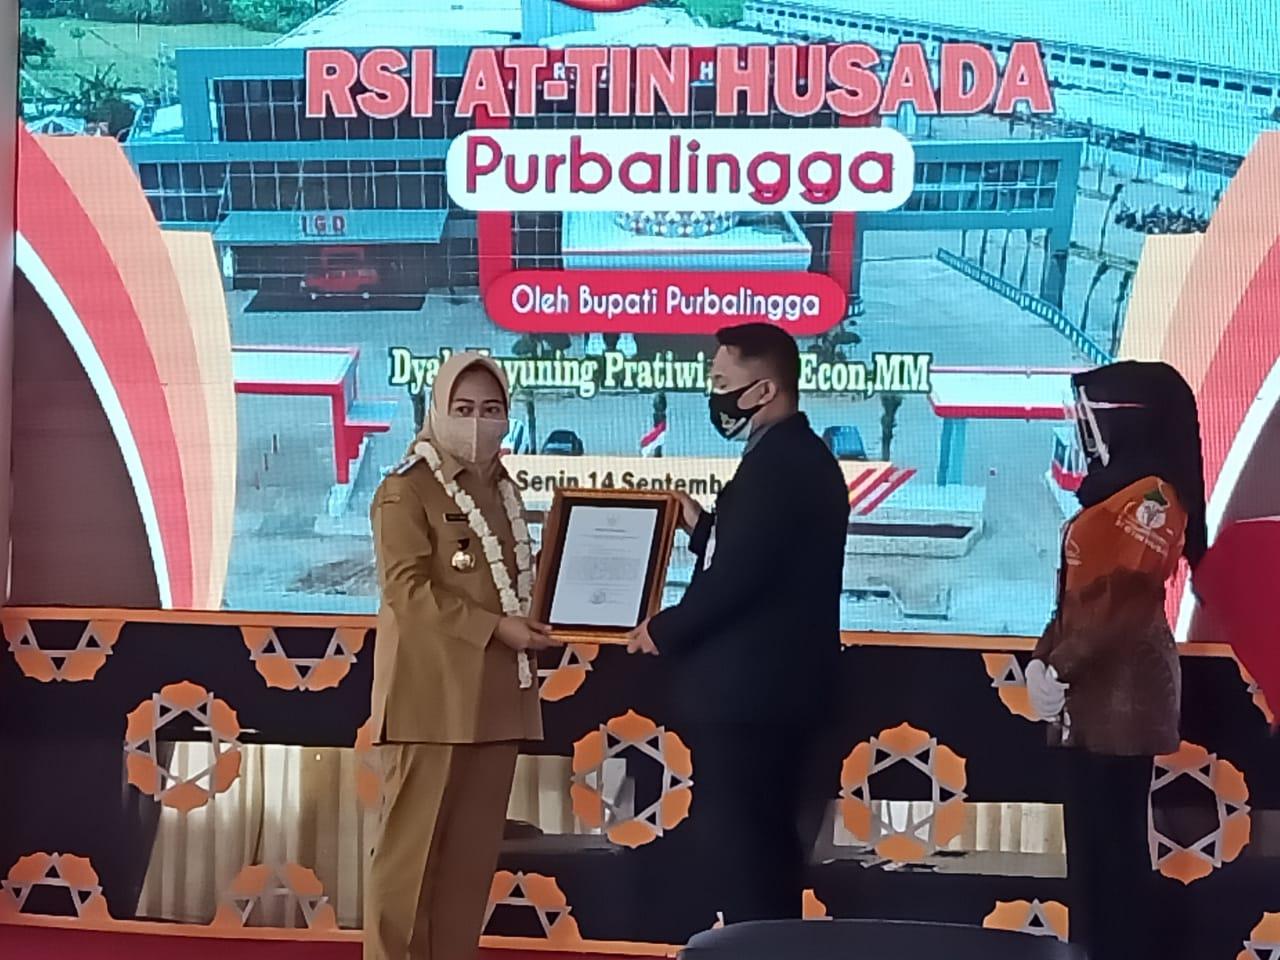 Photo of RSI At-Tin Hadir Di Purbalingga